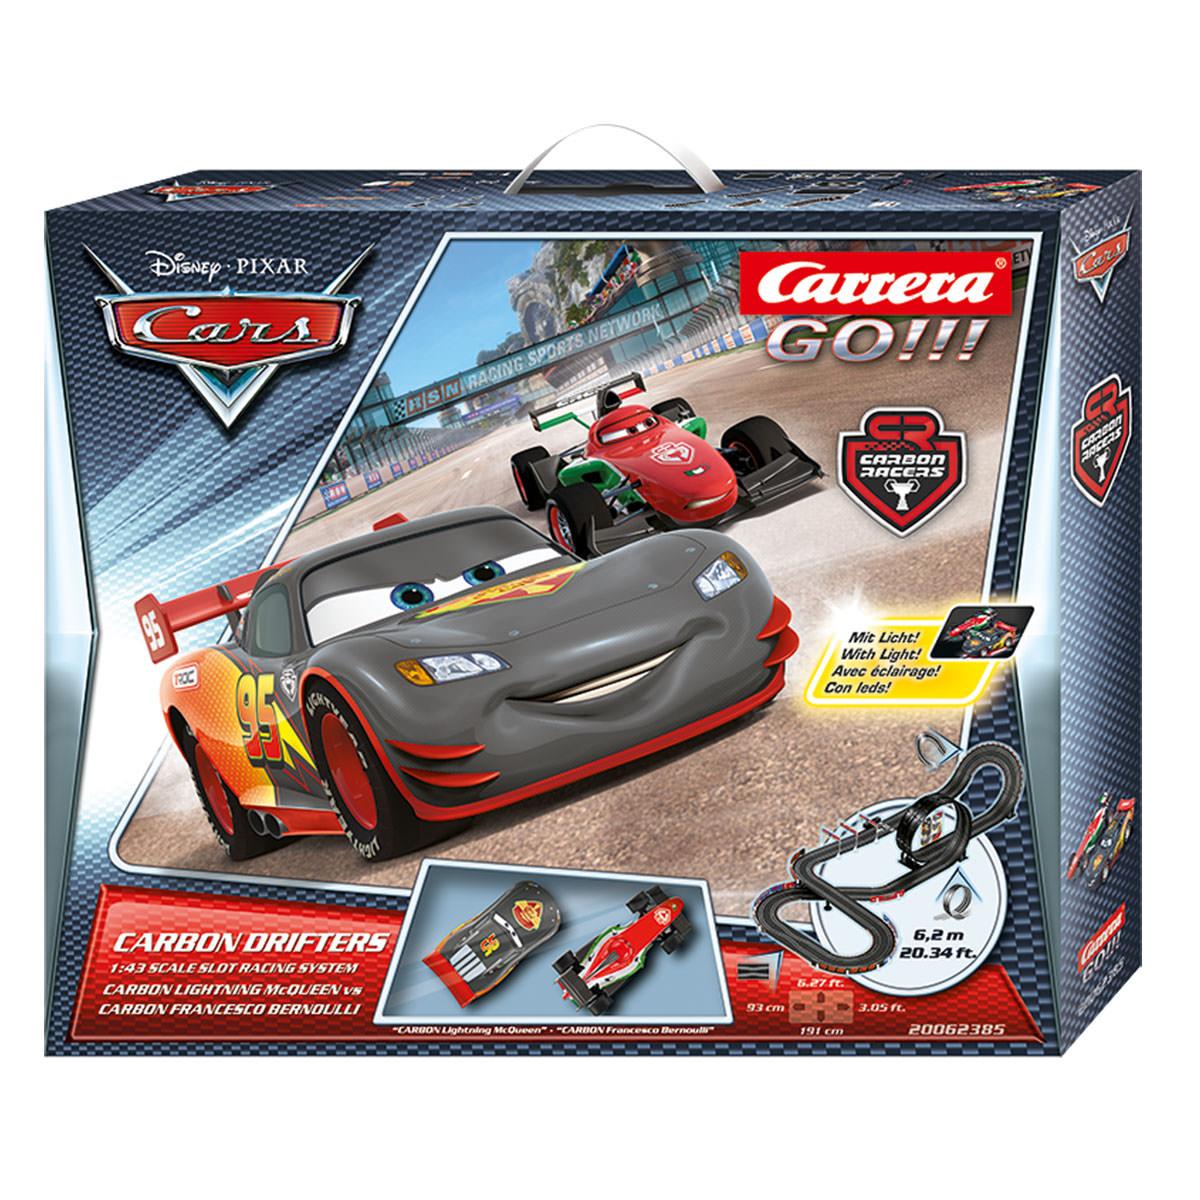 Carrera GO!!! Disney Cars Carbon Drifters 1:43 Scale Slot